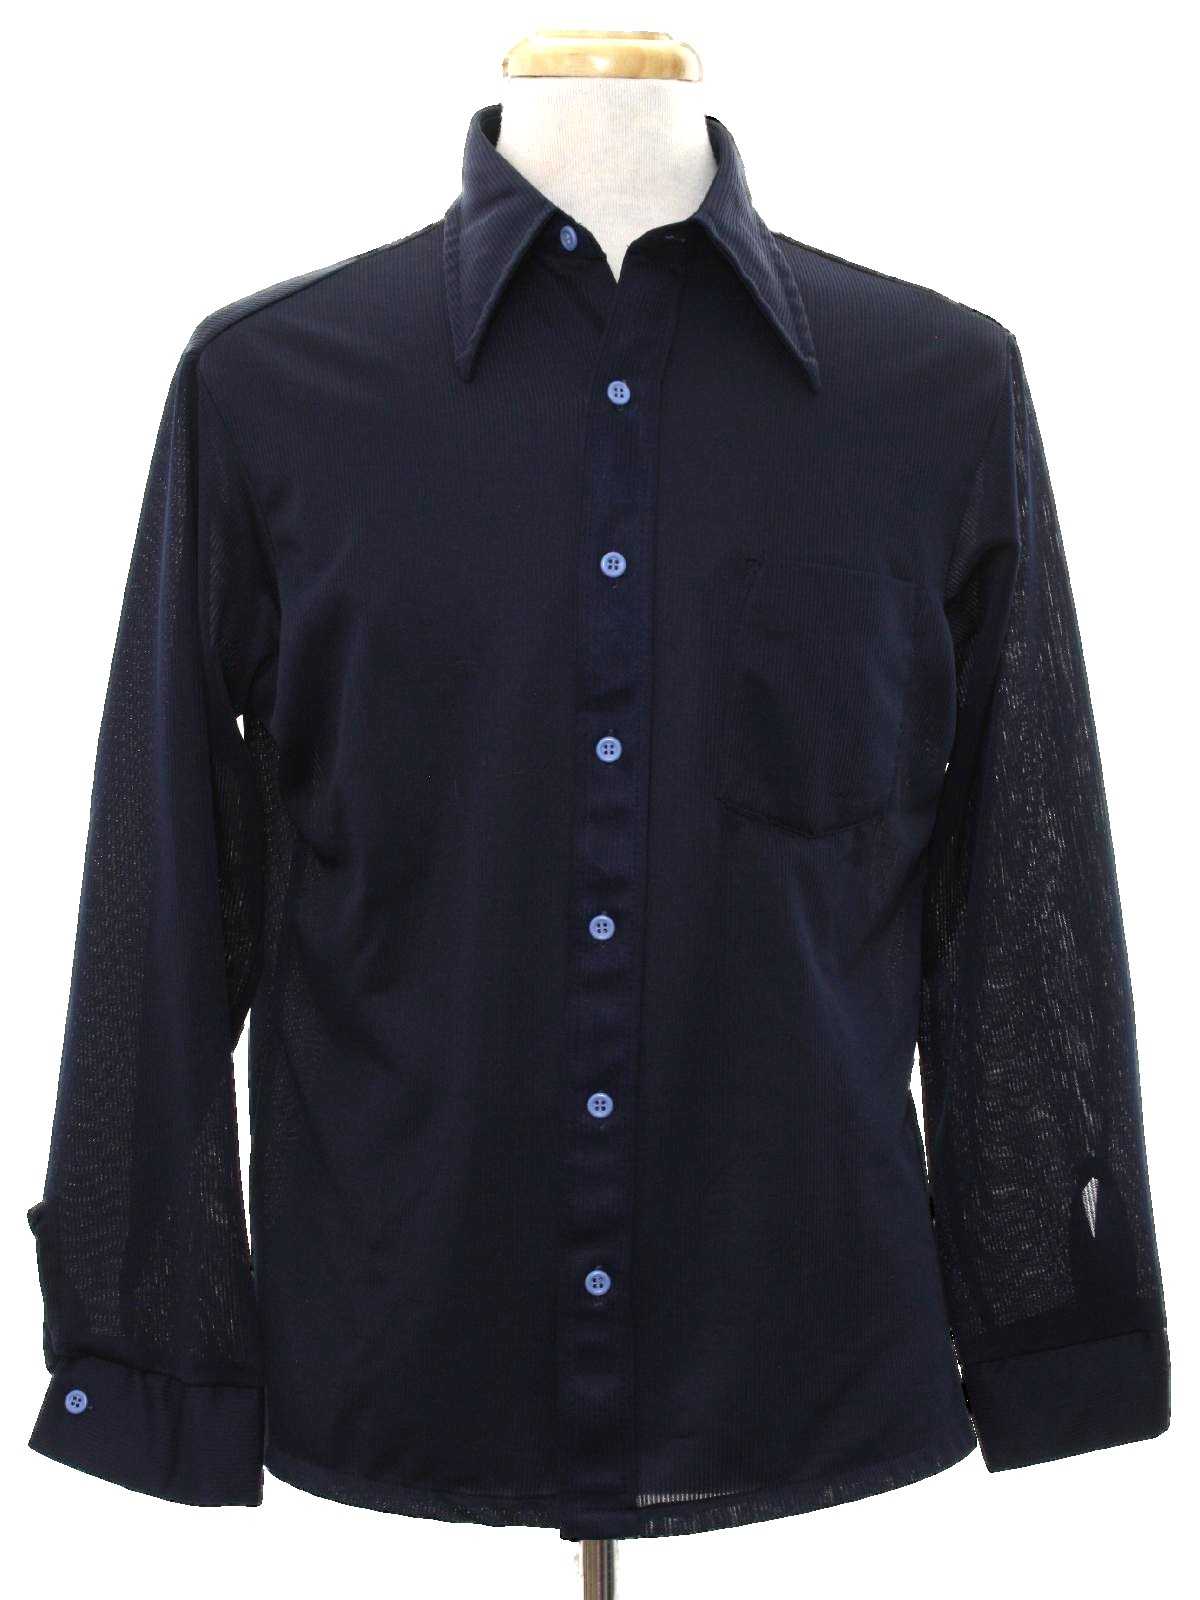 1970 39 s vintage kmart disco shirt 70s kmart mens for Kmart button up shirts